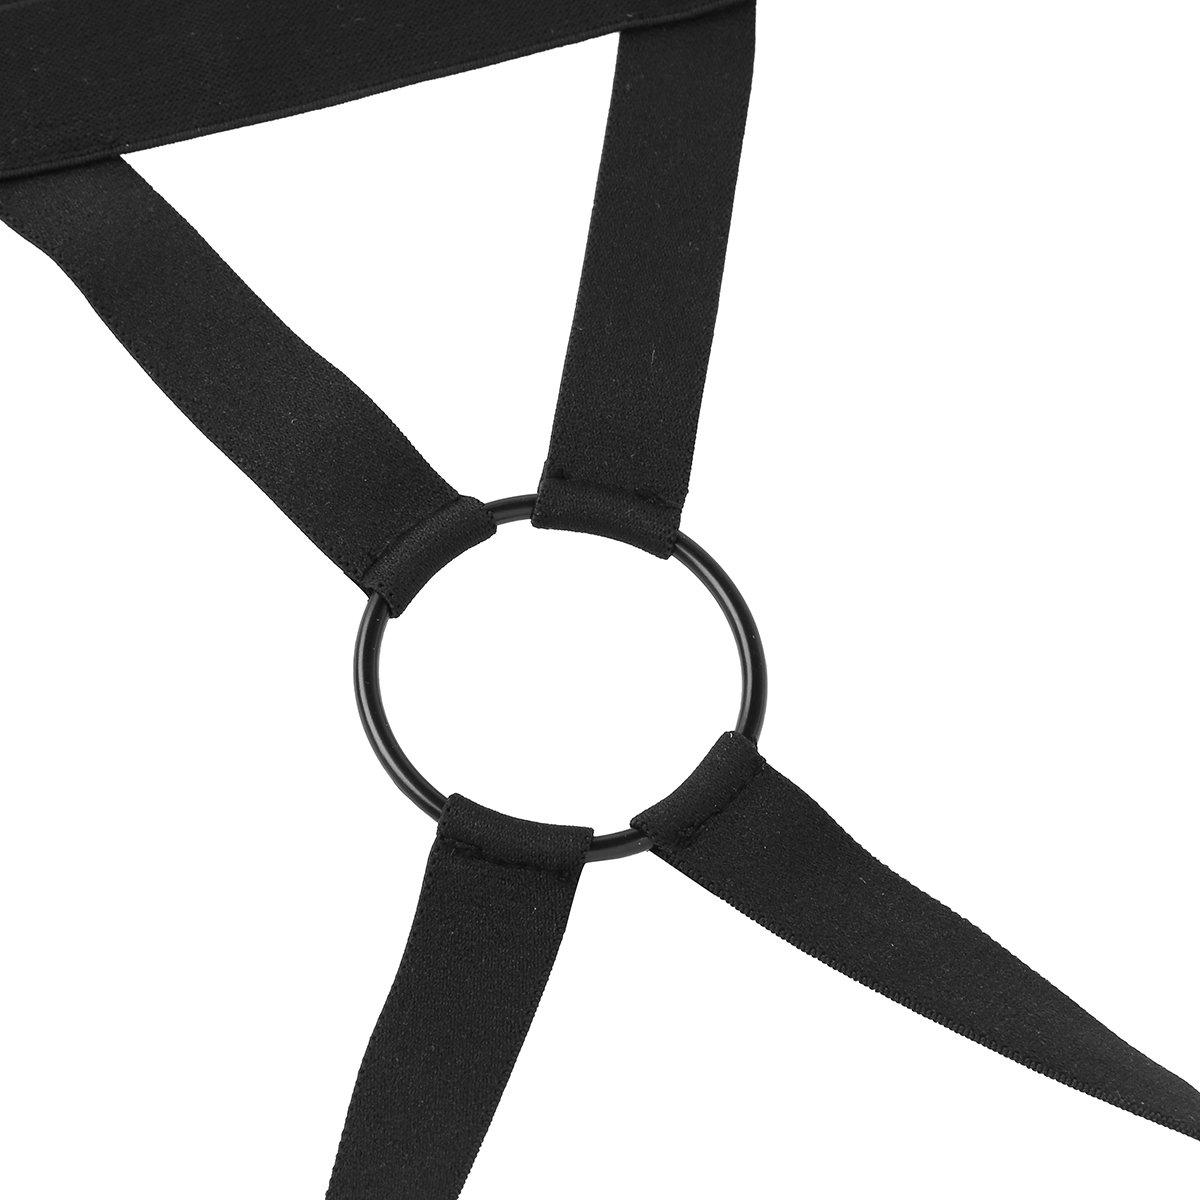 ACSUSS Men's Stretch Nylon Underwear Metal O-Ring Jockstrap Lingerie T-Back Thongs Black Medium(Waist 31.5-51.0''/80-130cm) by ACSUSS (Image #5)